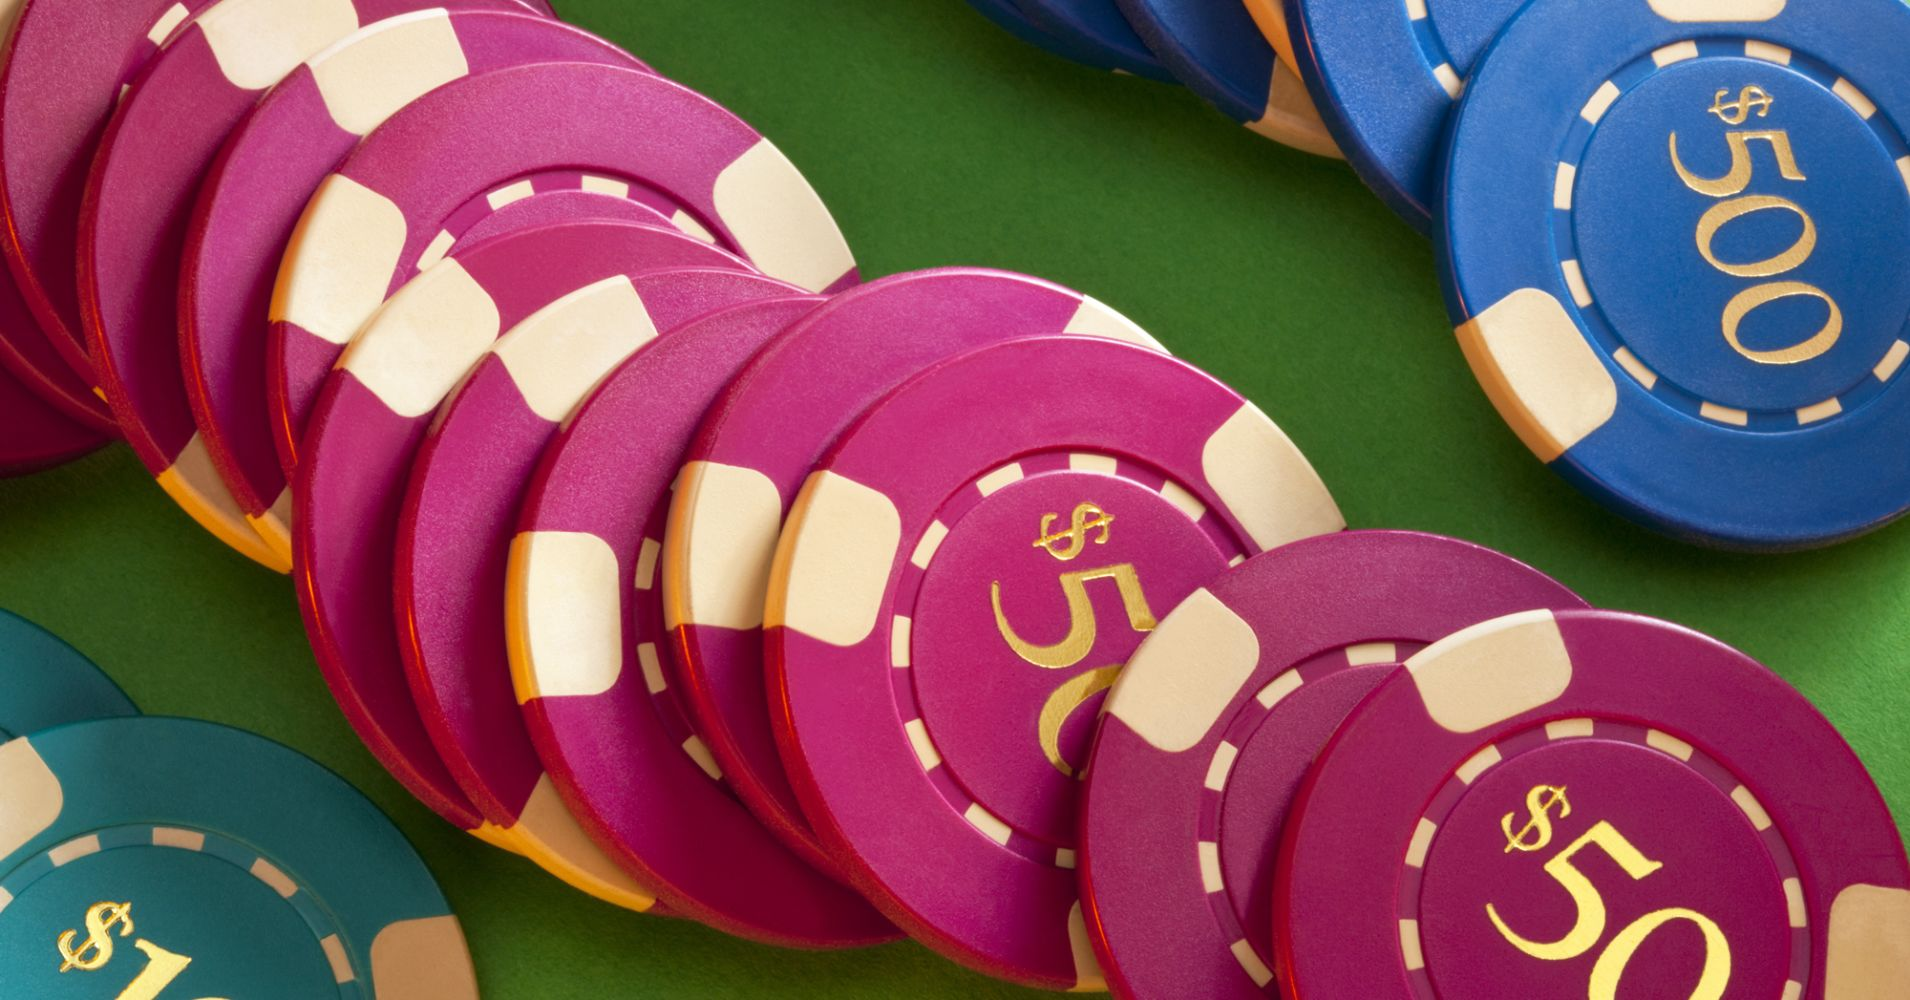 casino gamble gambling gaming chips_1530223310756.jpg.jpg